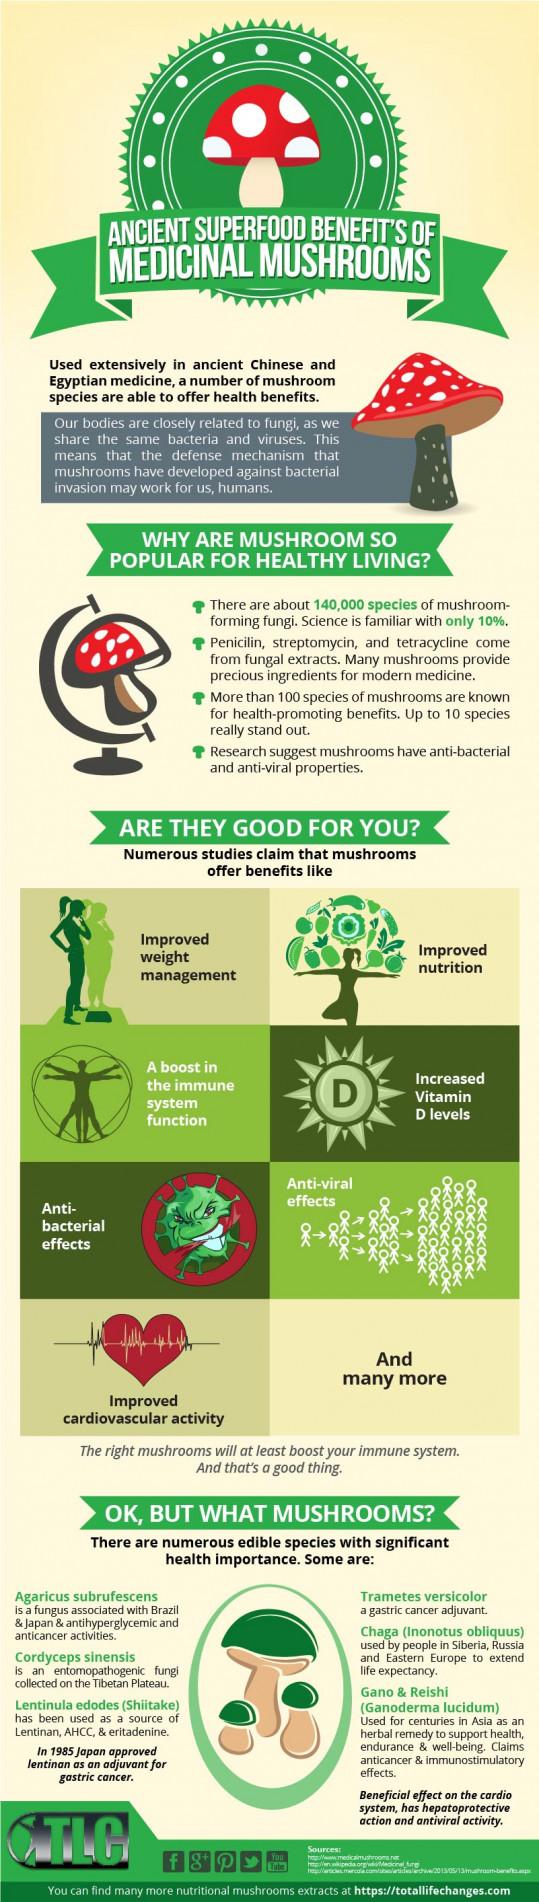 The Ancient Superfood Benefits of Medicinal Mushrooms